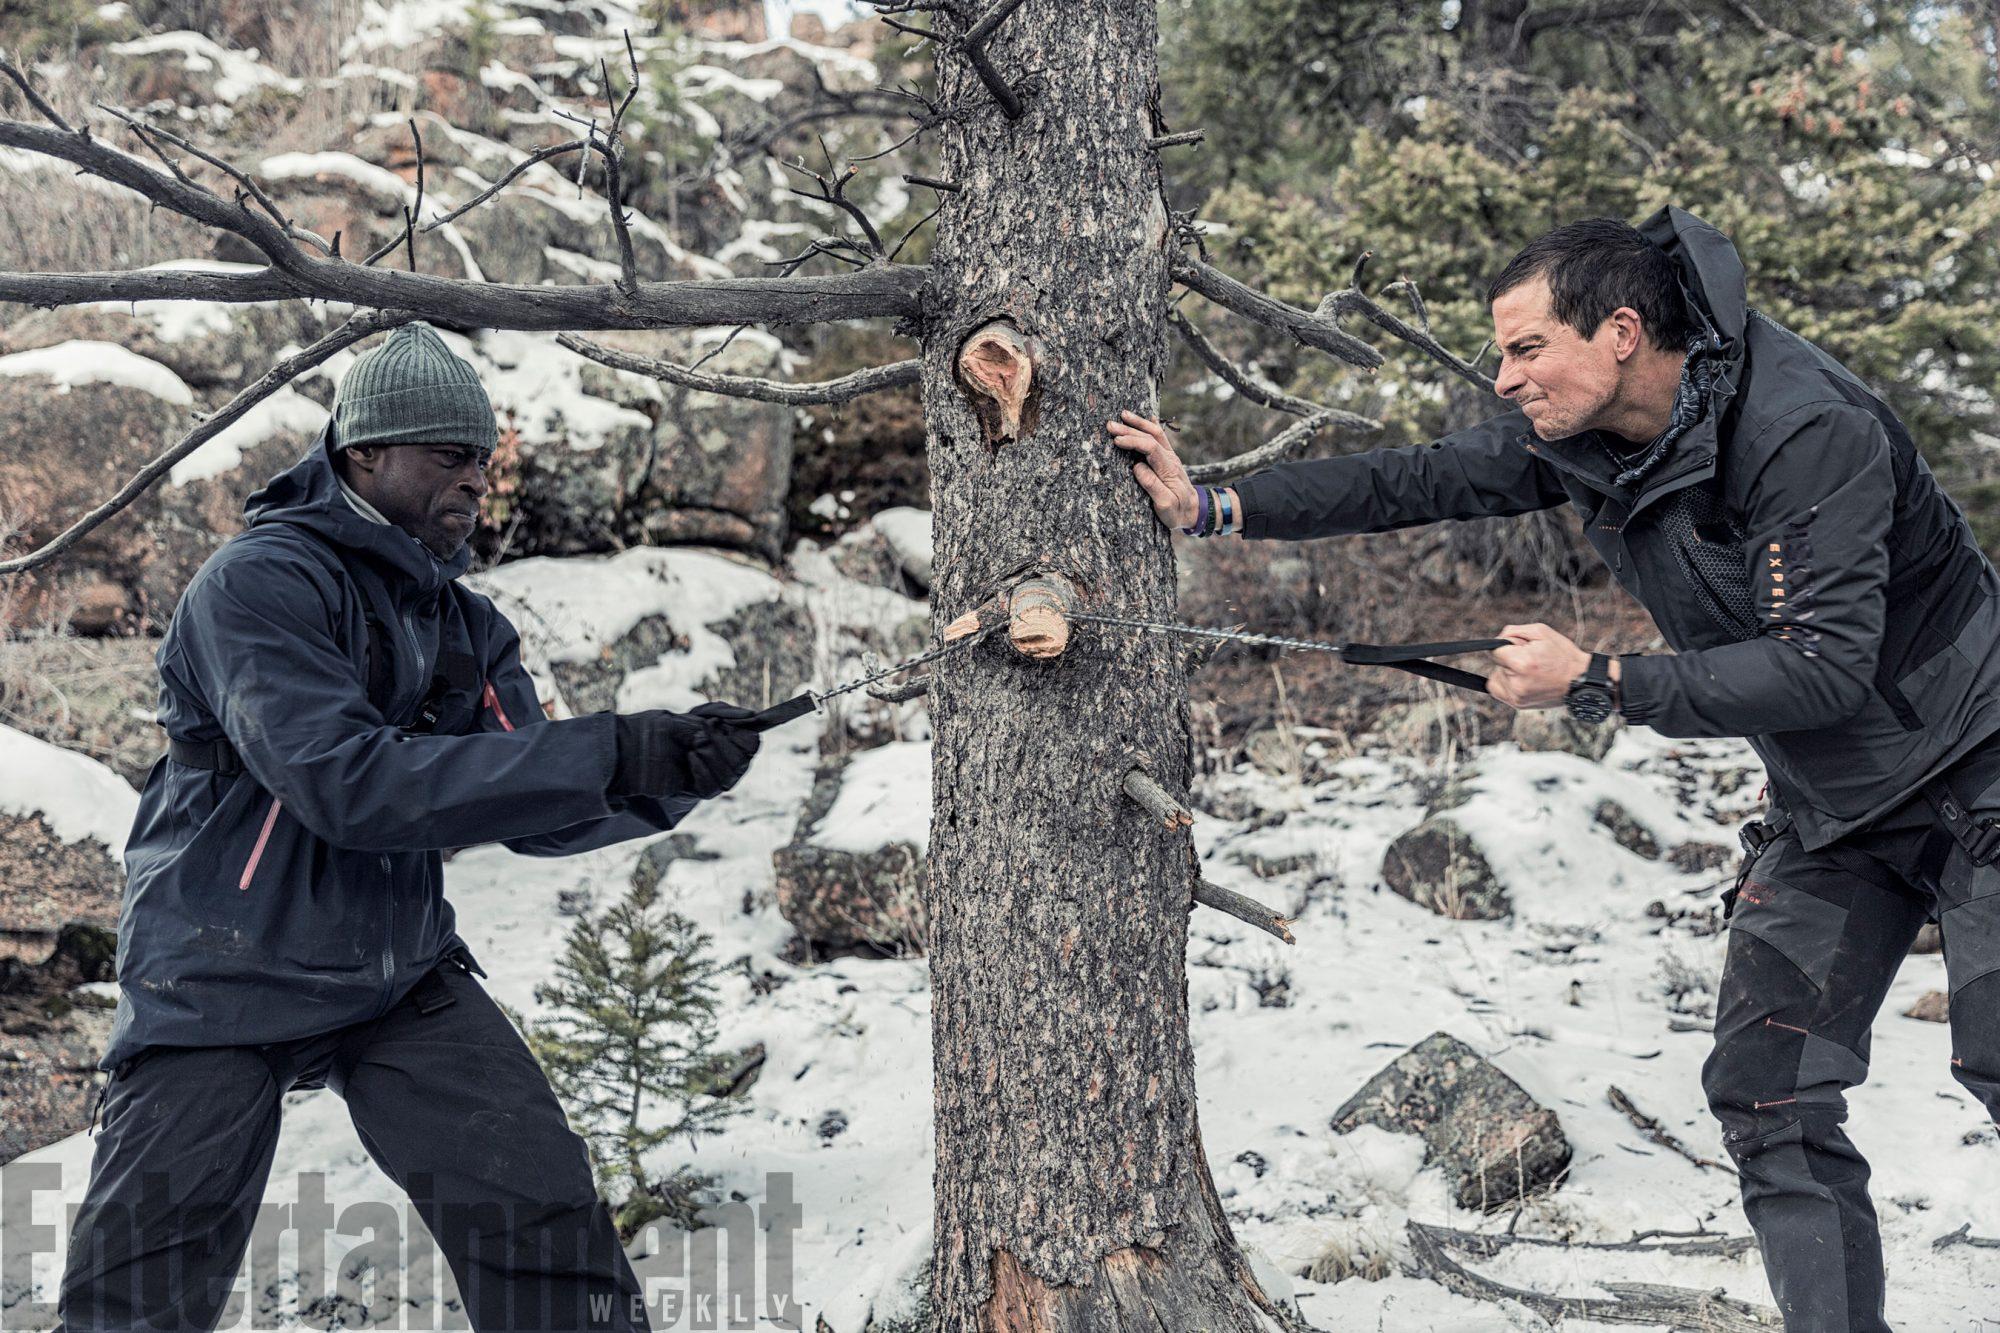 Running Wild with Bear Grylls - Season 3